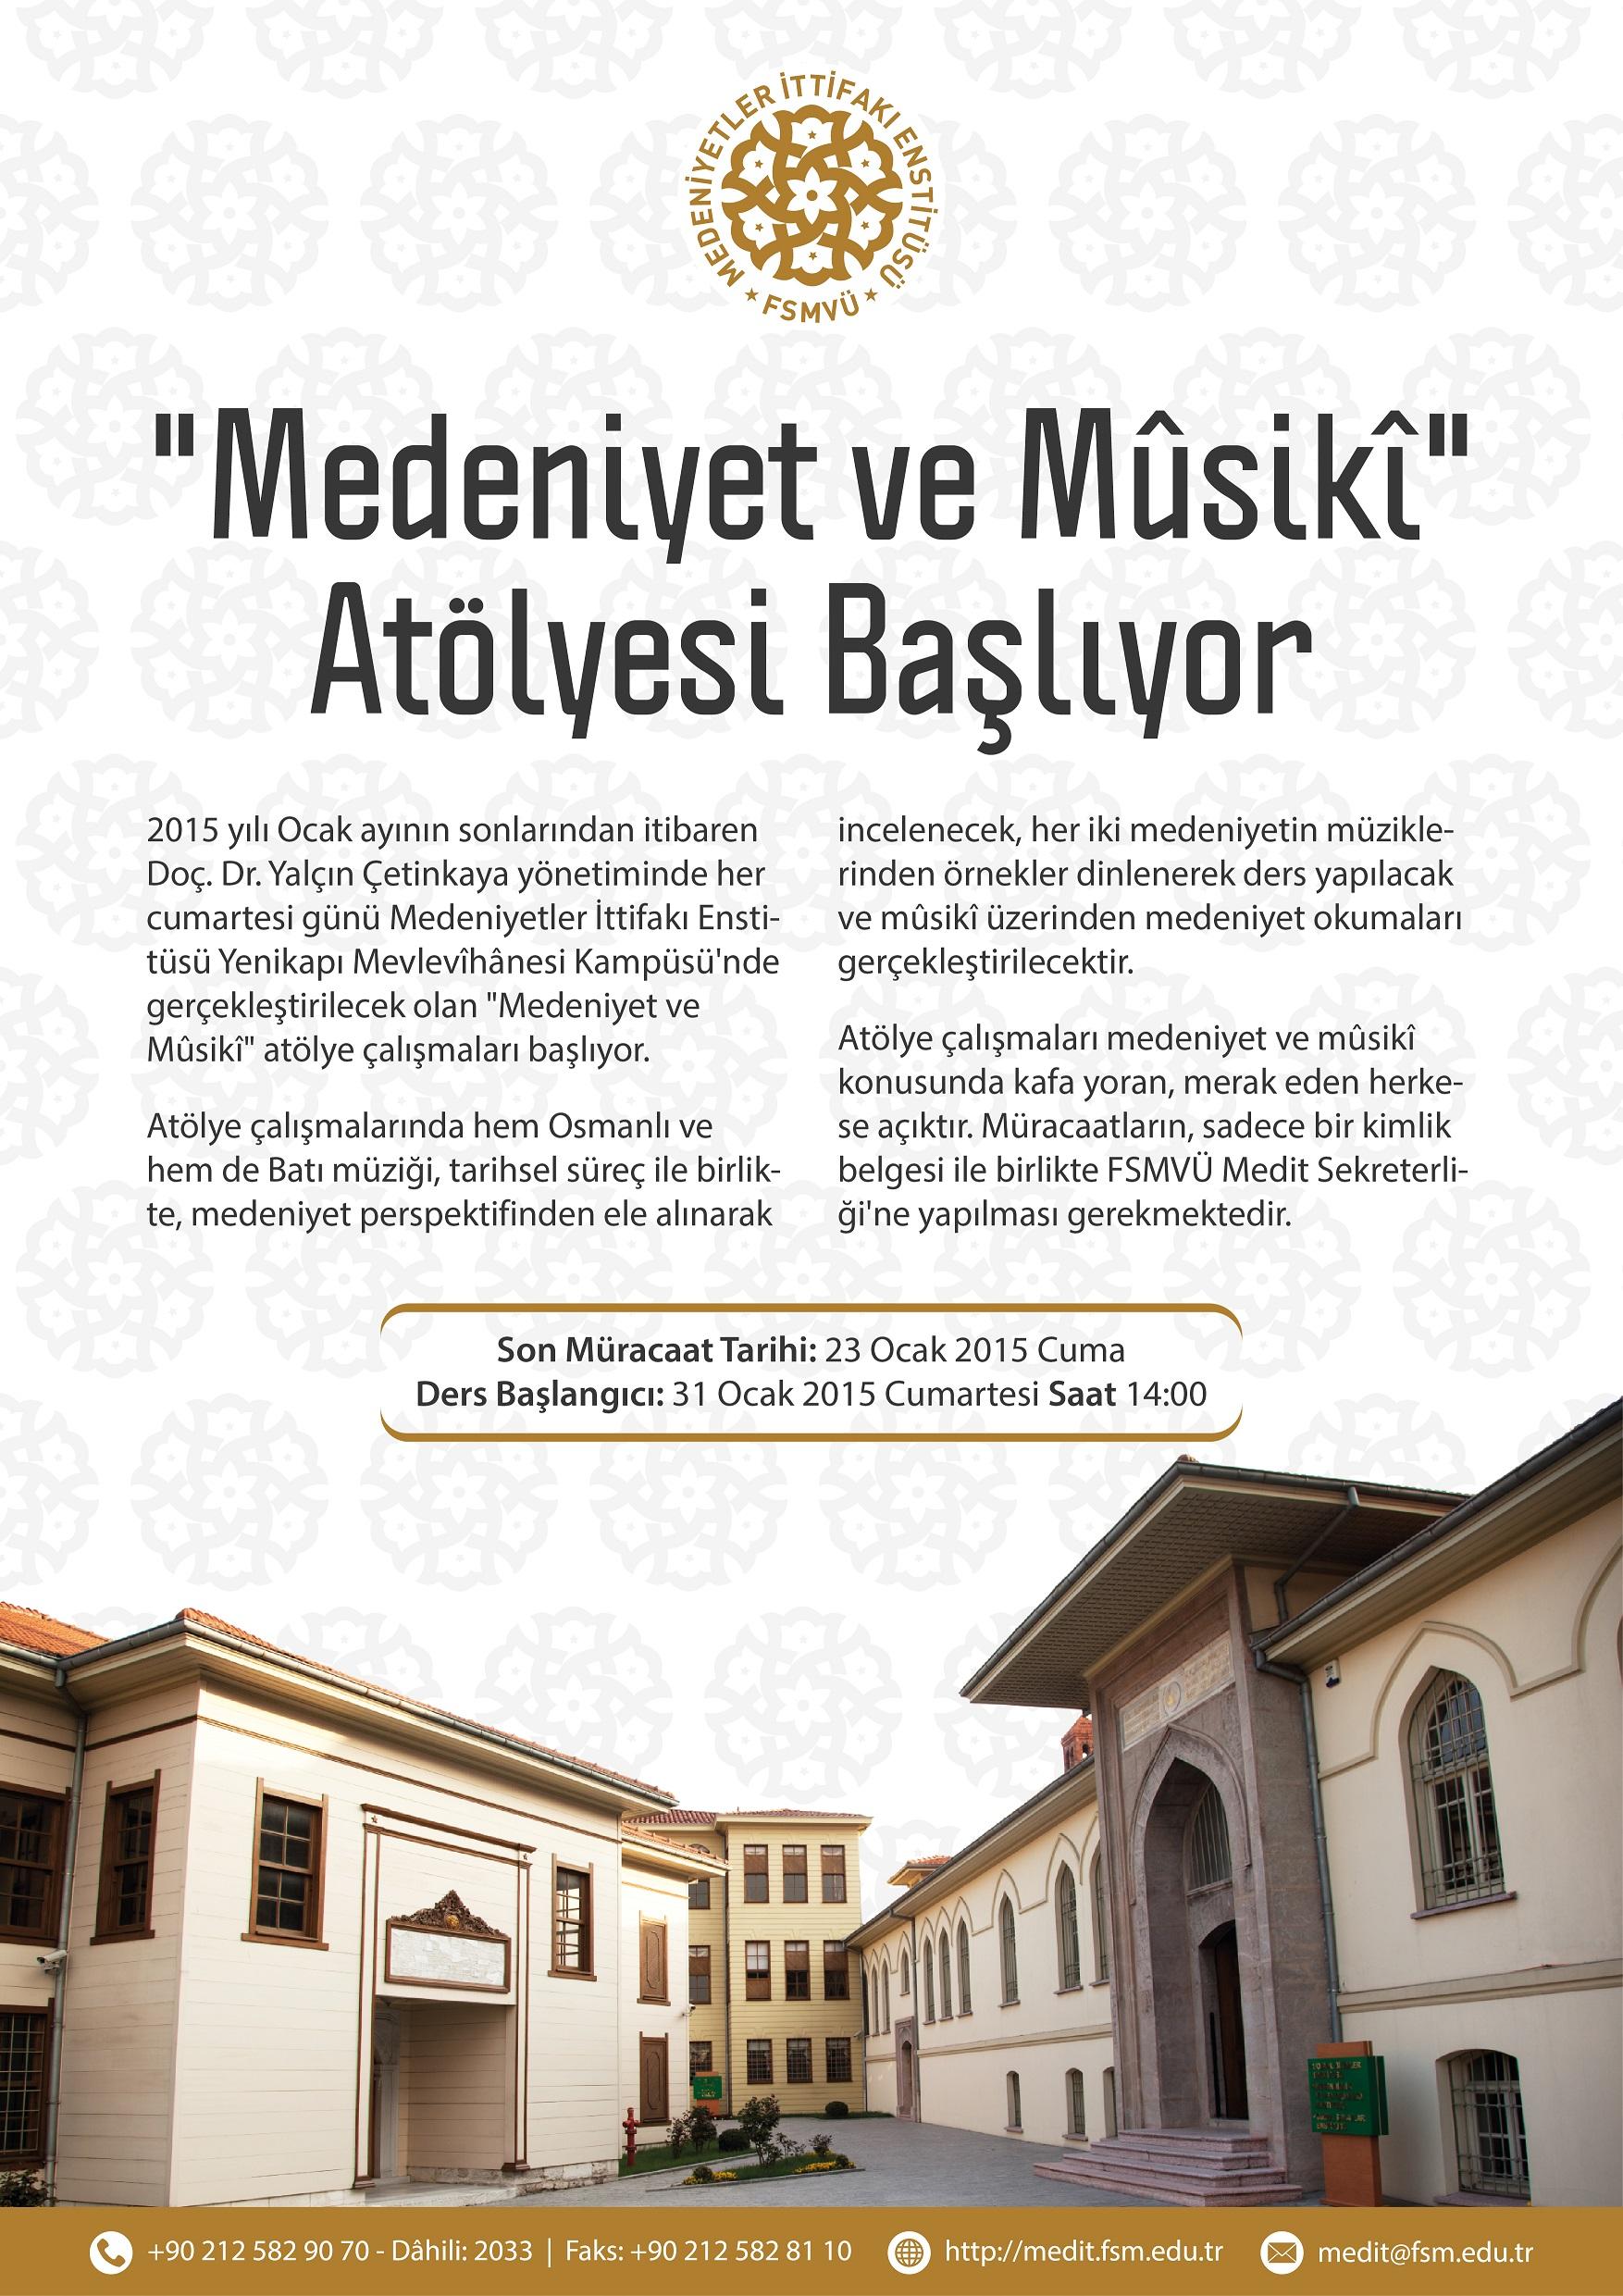 http://medit.fatihsultan.edu.tr/resimler/upload/Medeniyet-ve-Musiki-01-2130115.jpg